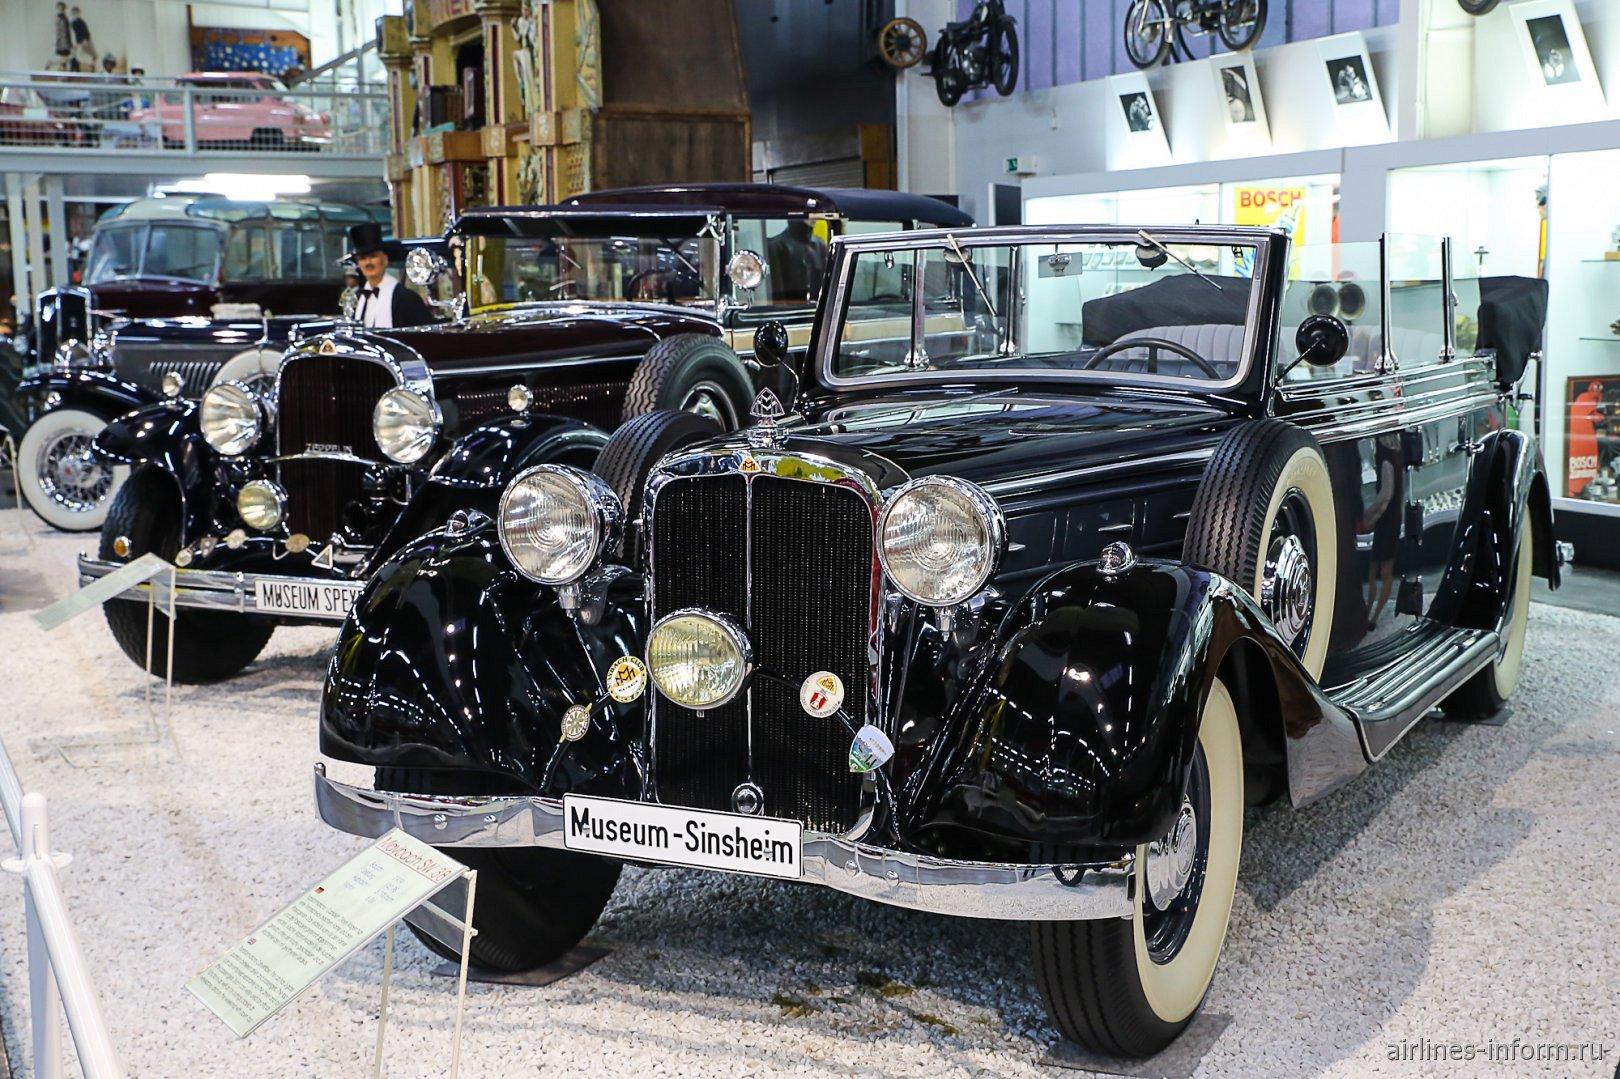 Автомобили Майбах в музее техники в Зинсхайме